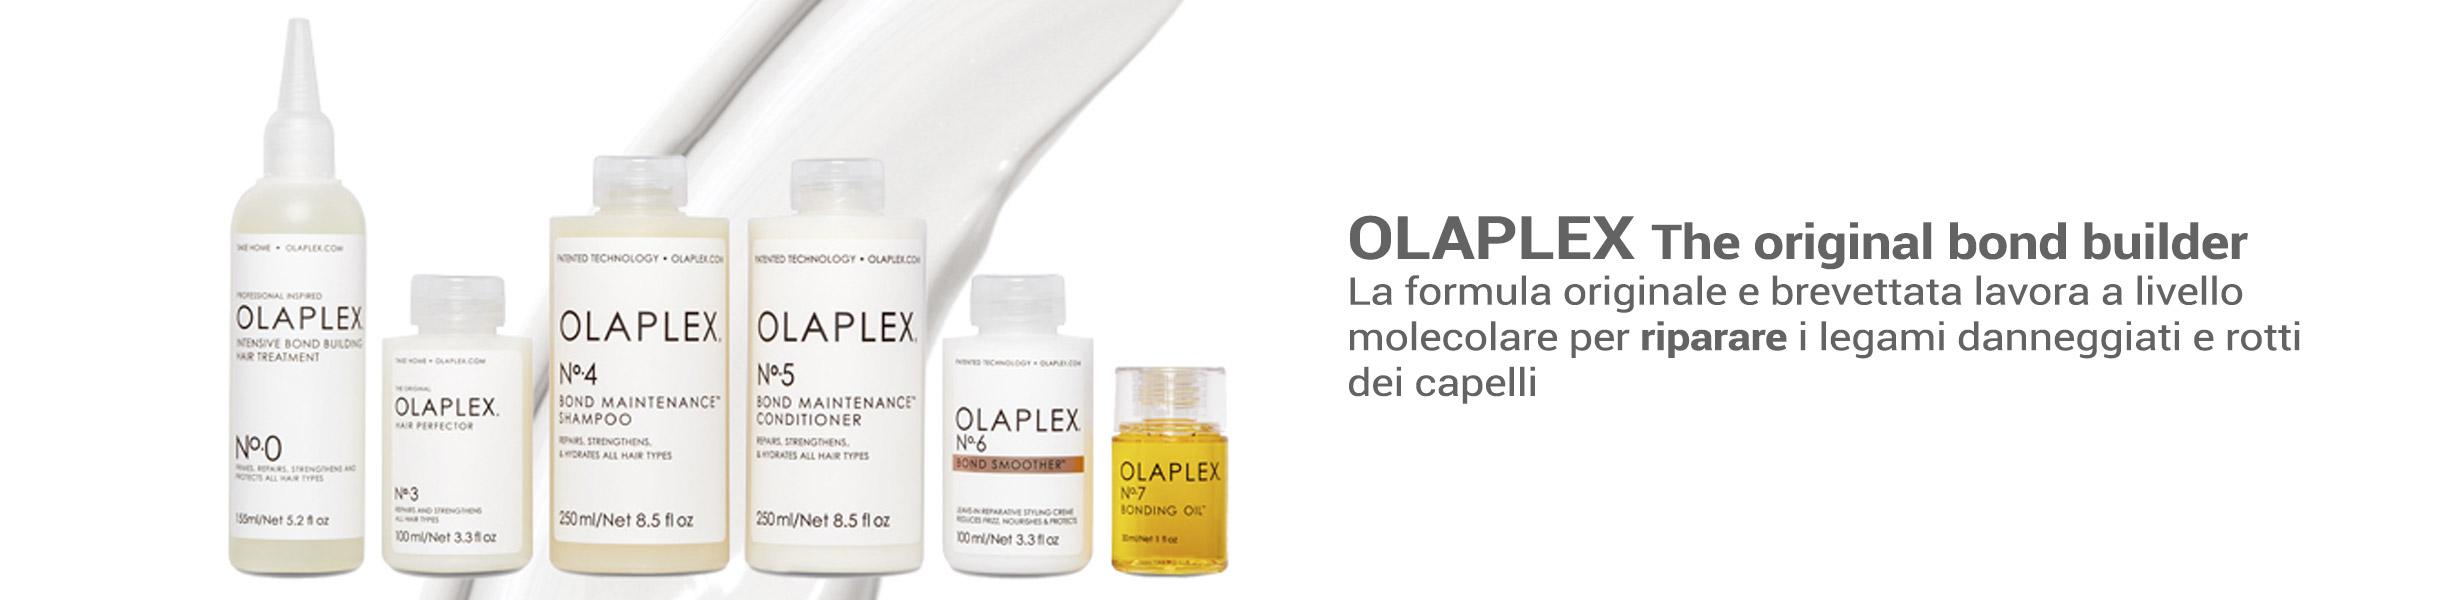 OLAPLEX PRODOTTI